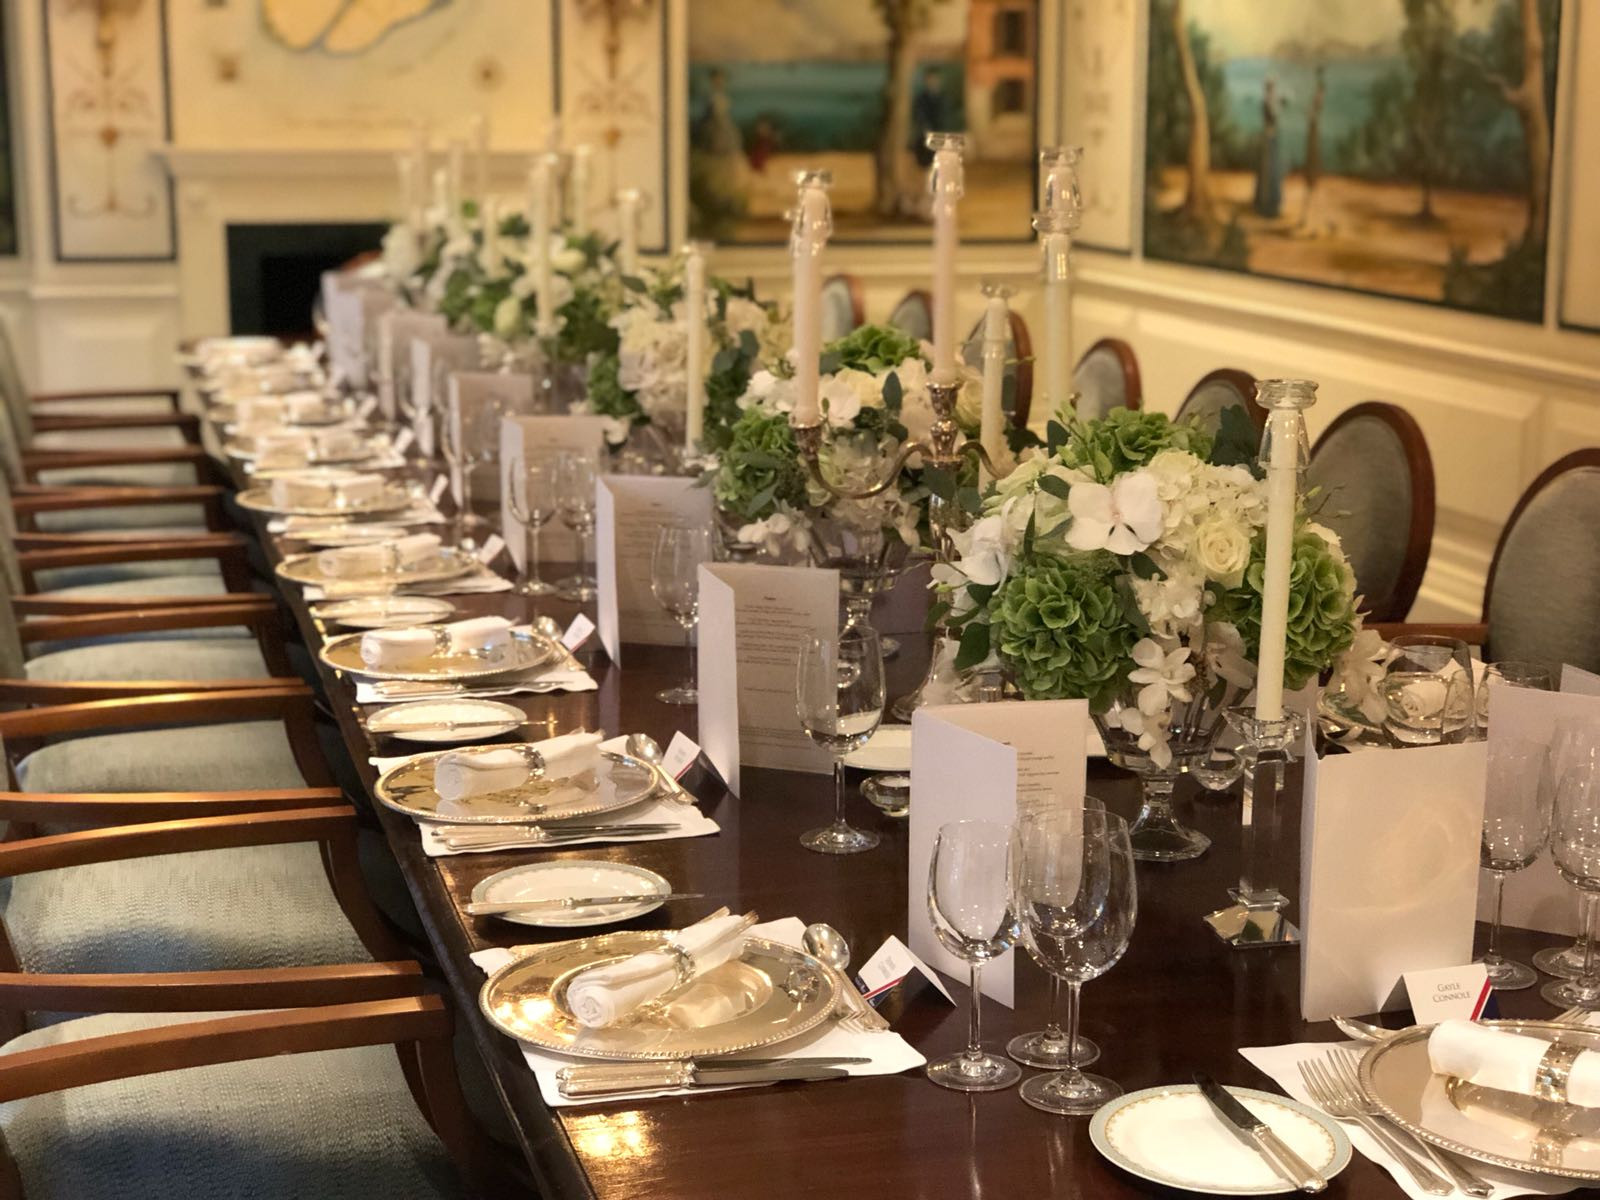 Savoy dinner party